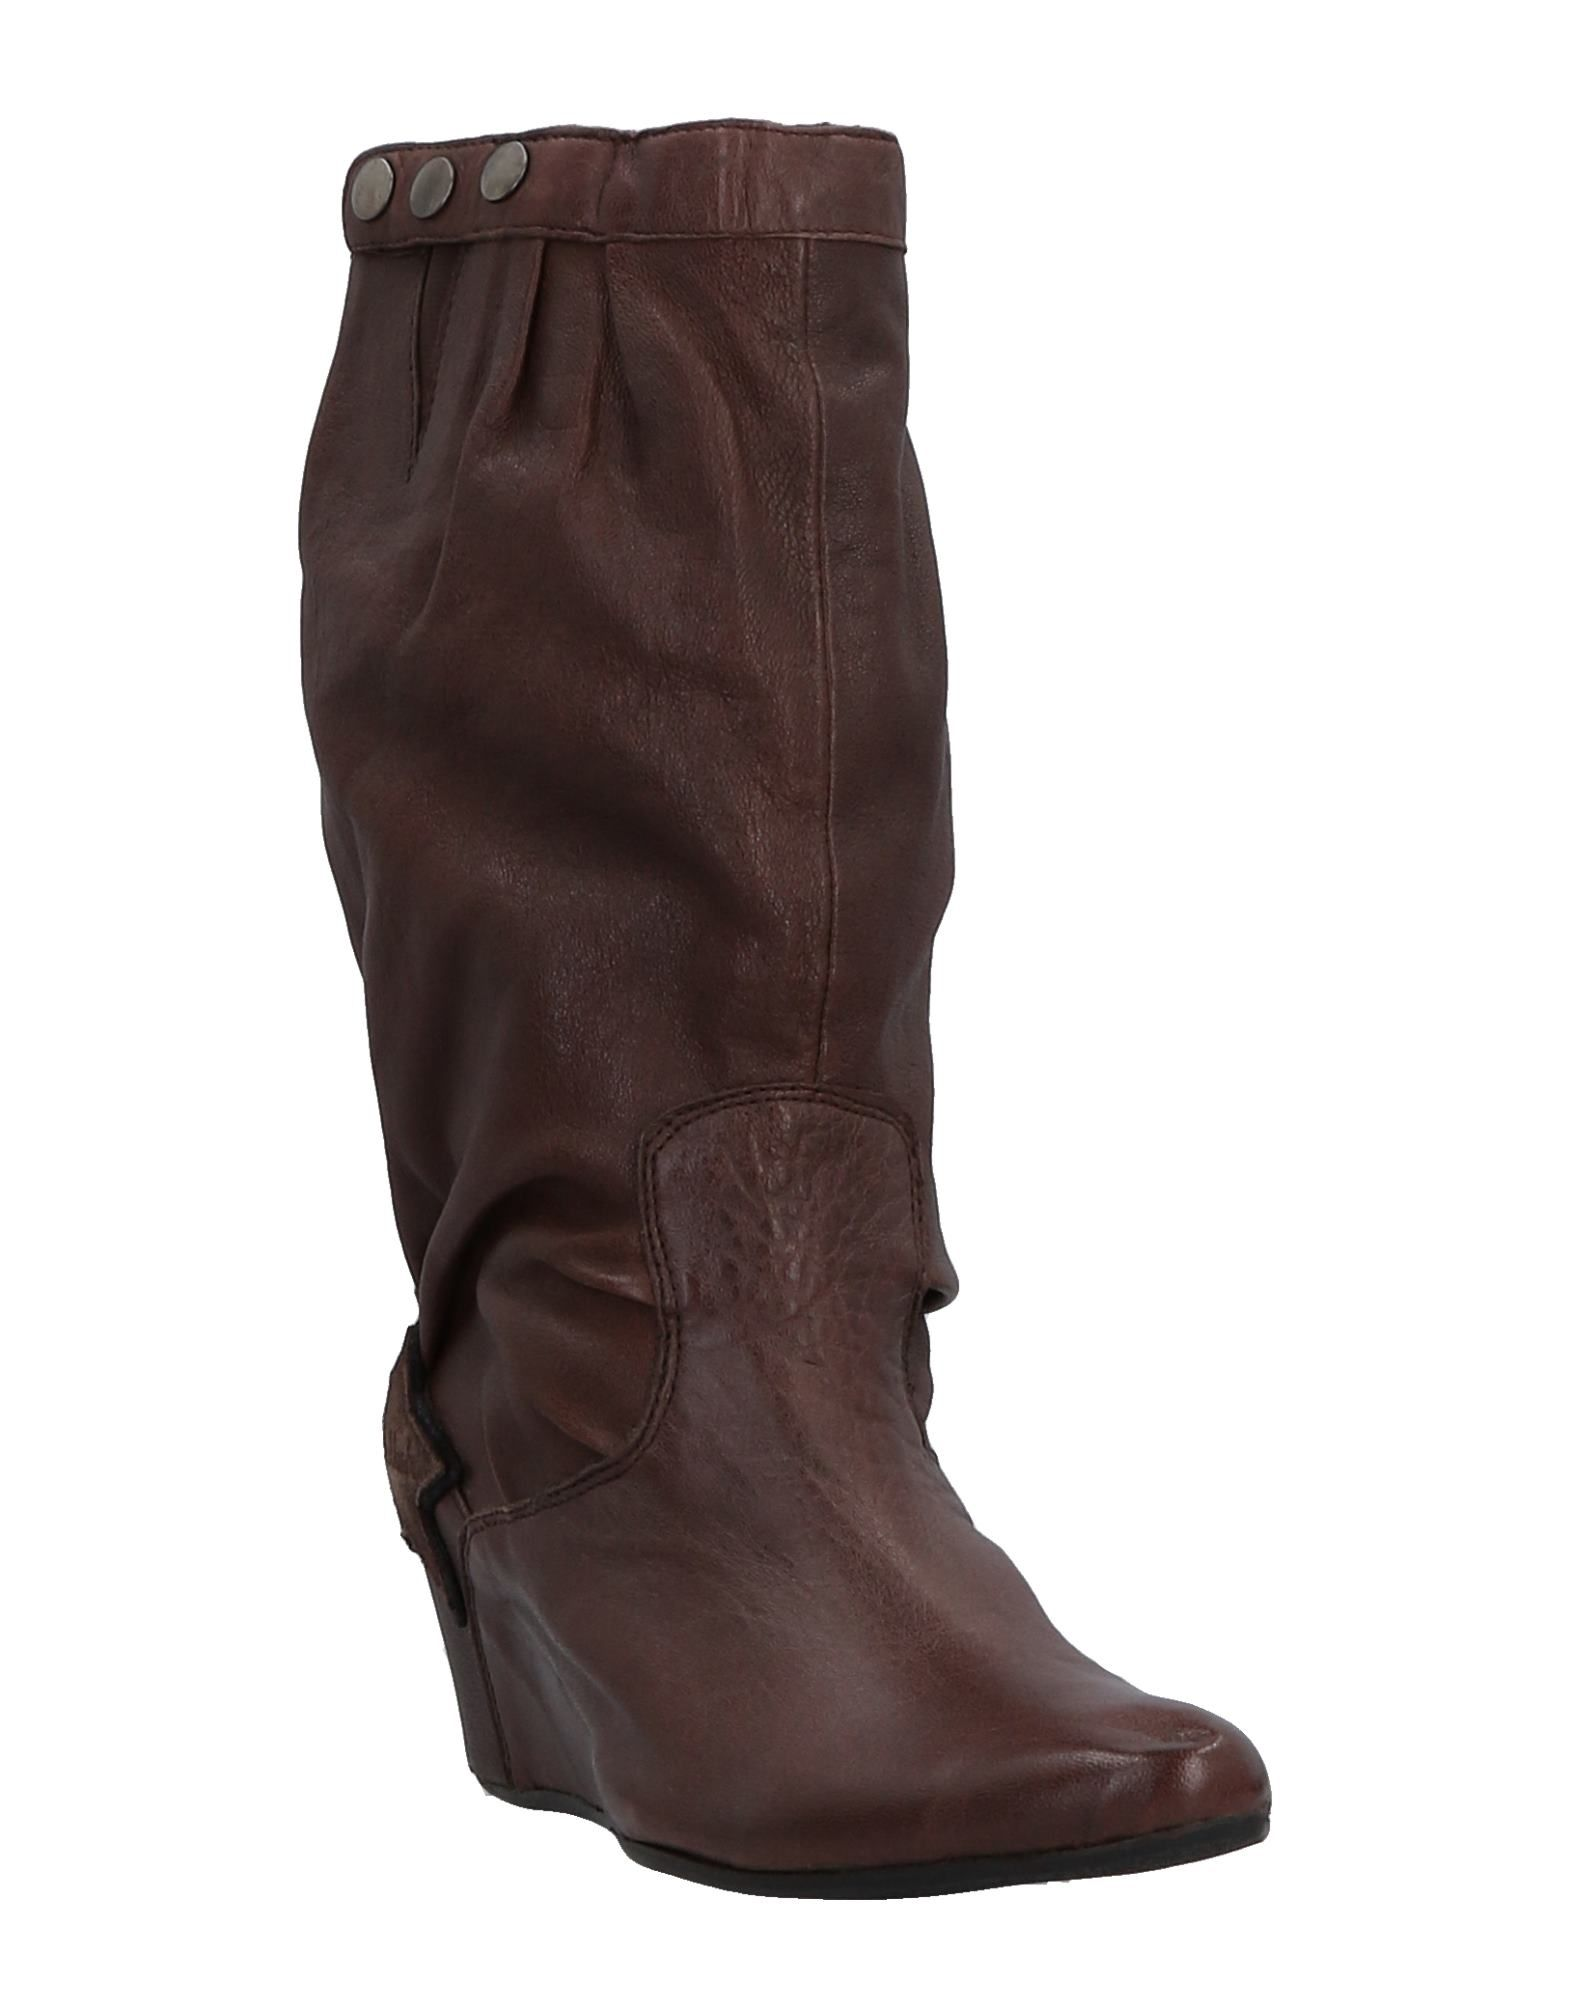 Killah 11512617NM Stiefel Damen  11512617NM Killah Gute Qualität beliebte Schuhe b1c7f1